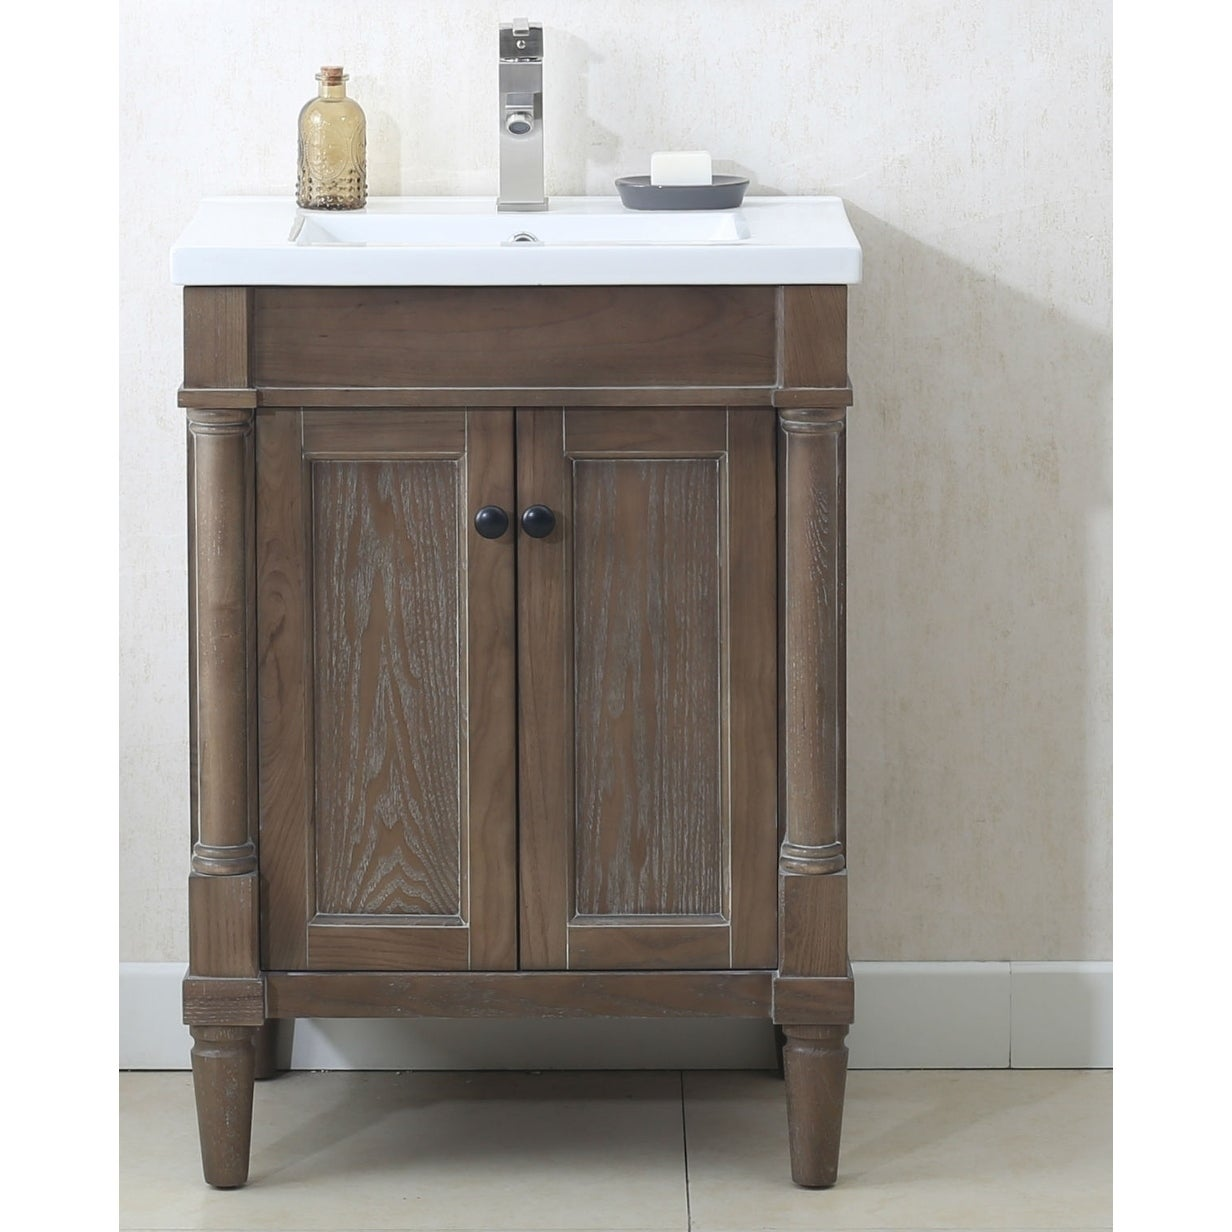 Legion Furniture 24 In Bathroom Vanity In Weathered Gray With Porcelain Top Overstock 20600799